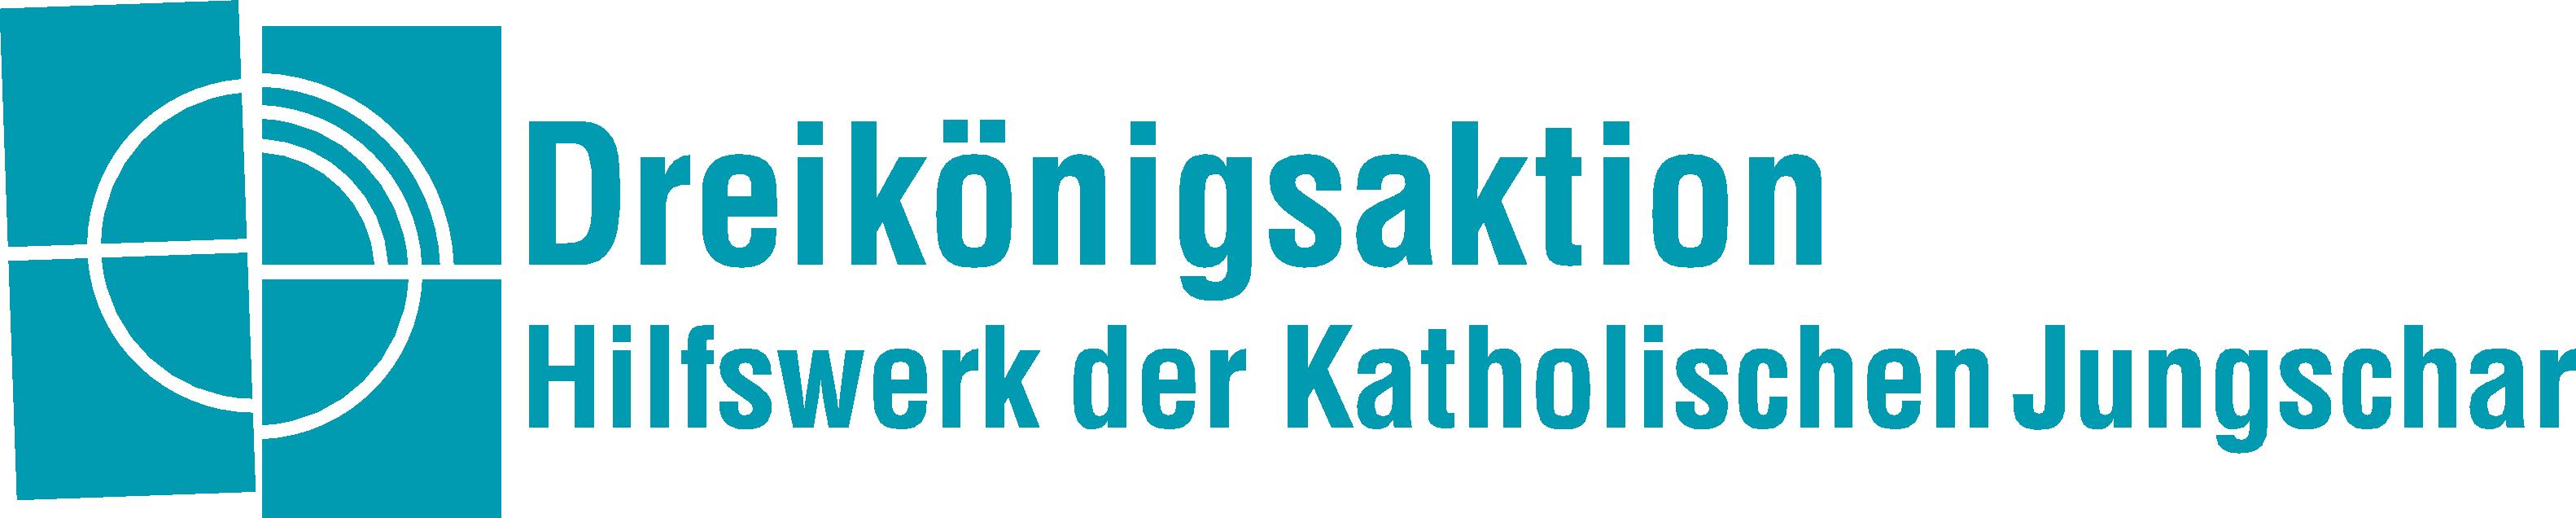 Logo: Dreikönigsaktion der Katholischen Jungschar